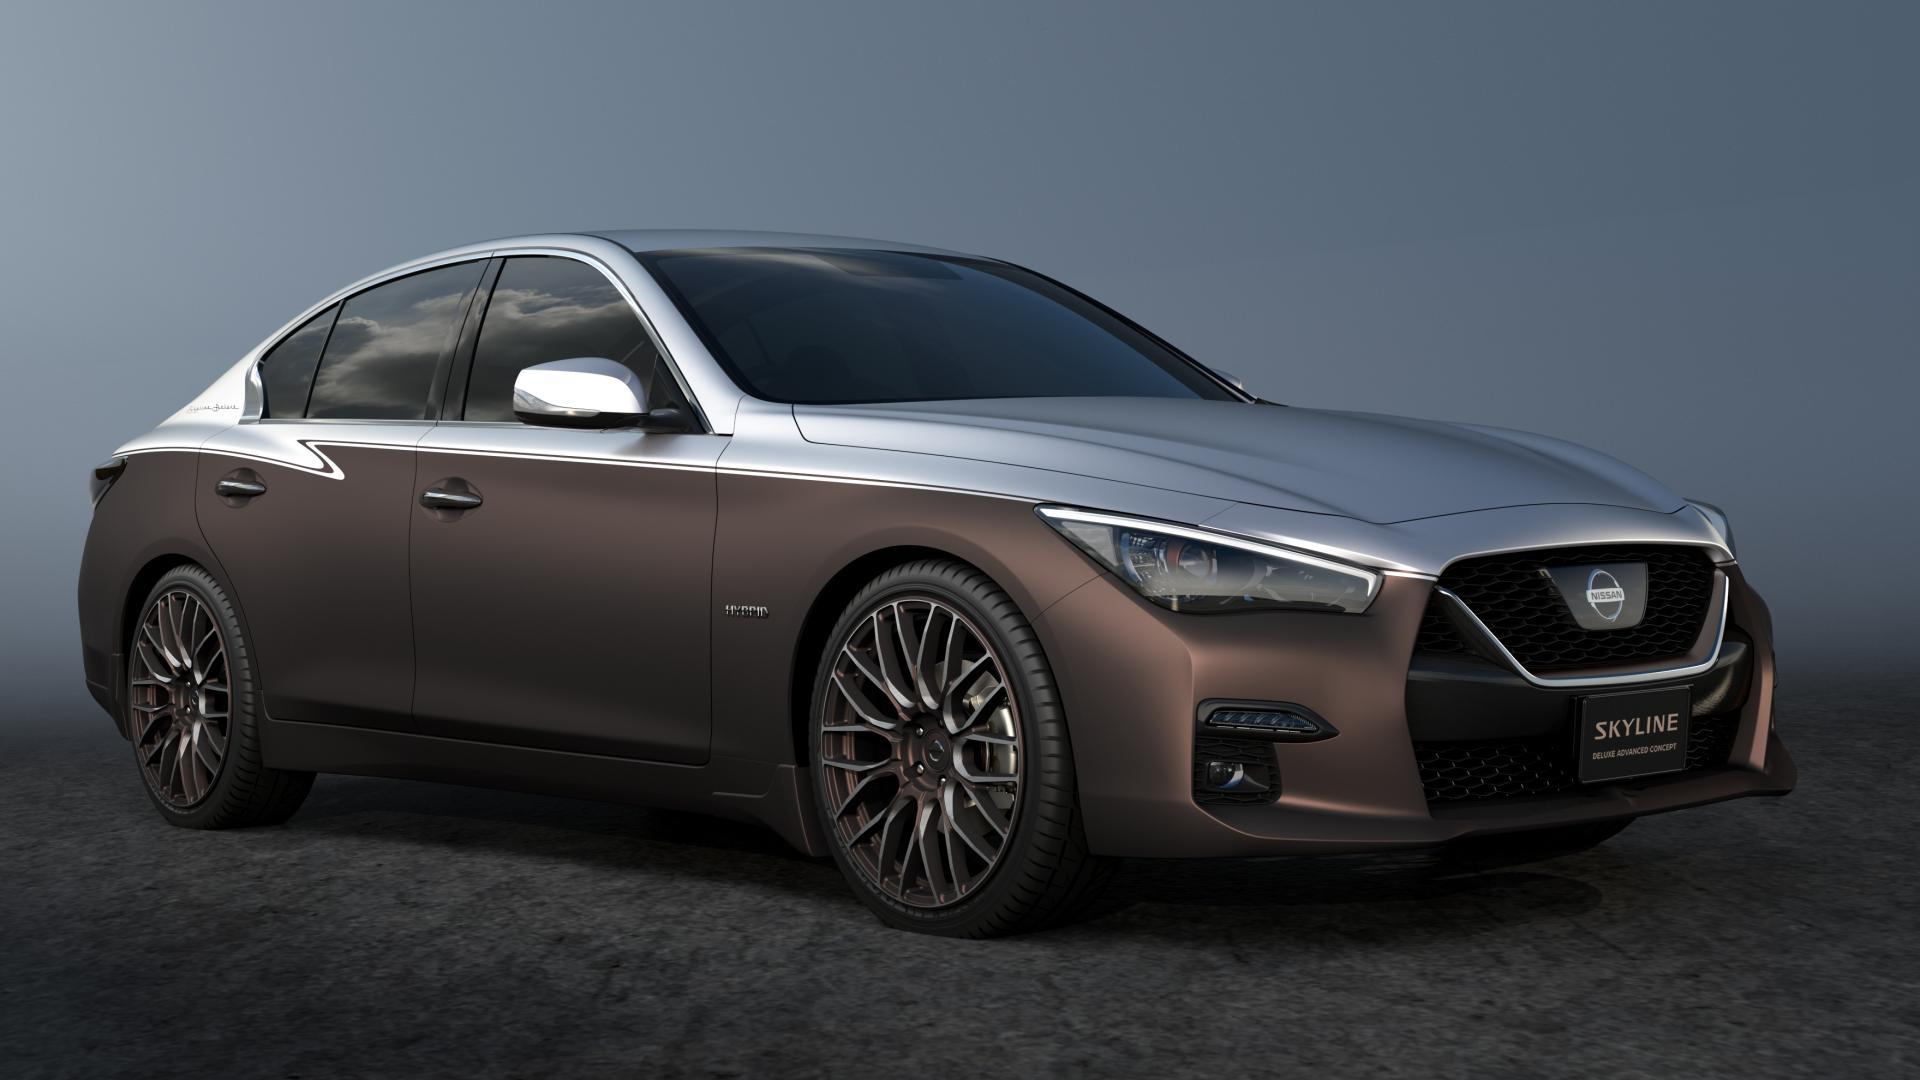 Nissan-Skyline-Deluxe-Advanced-Concept